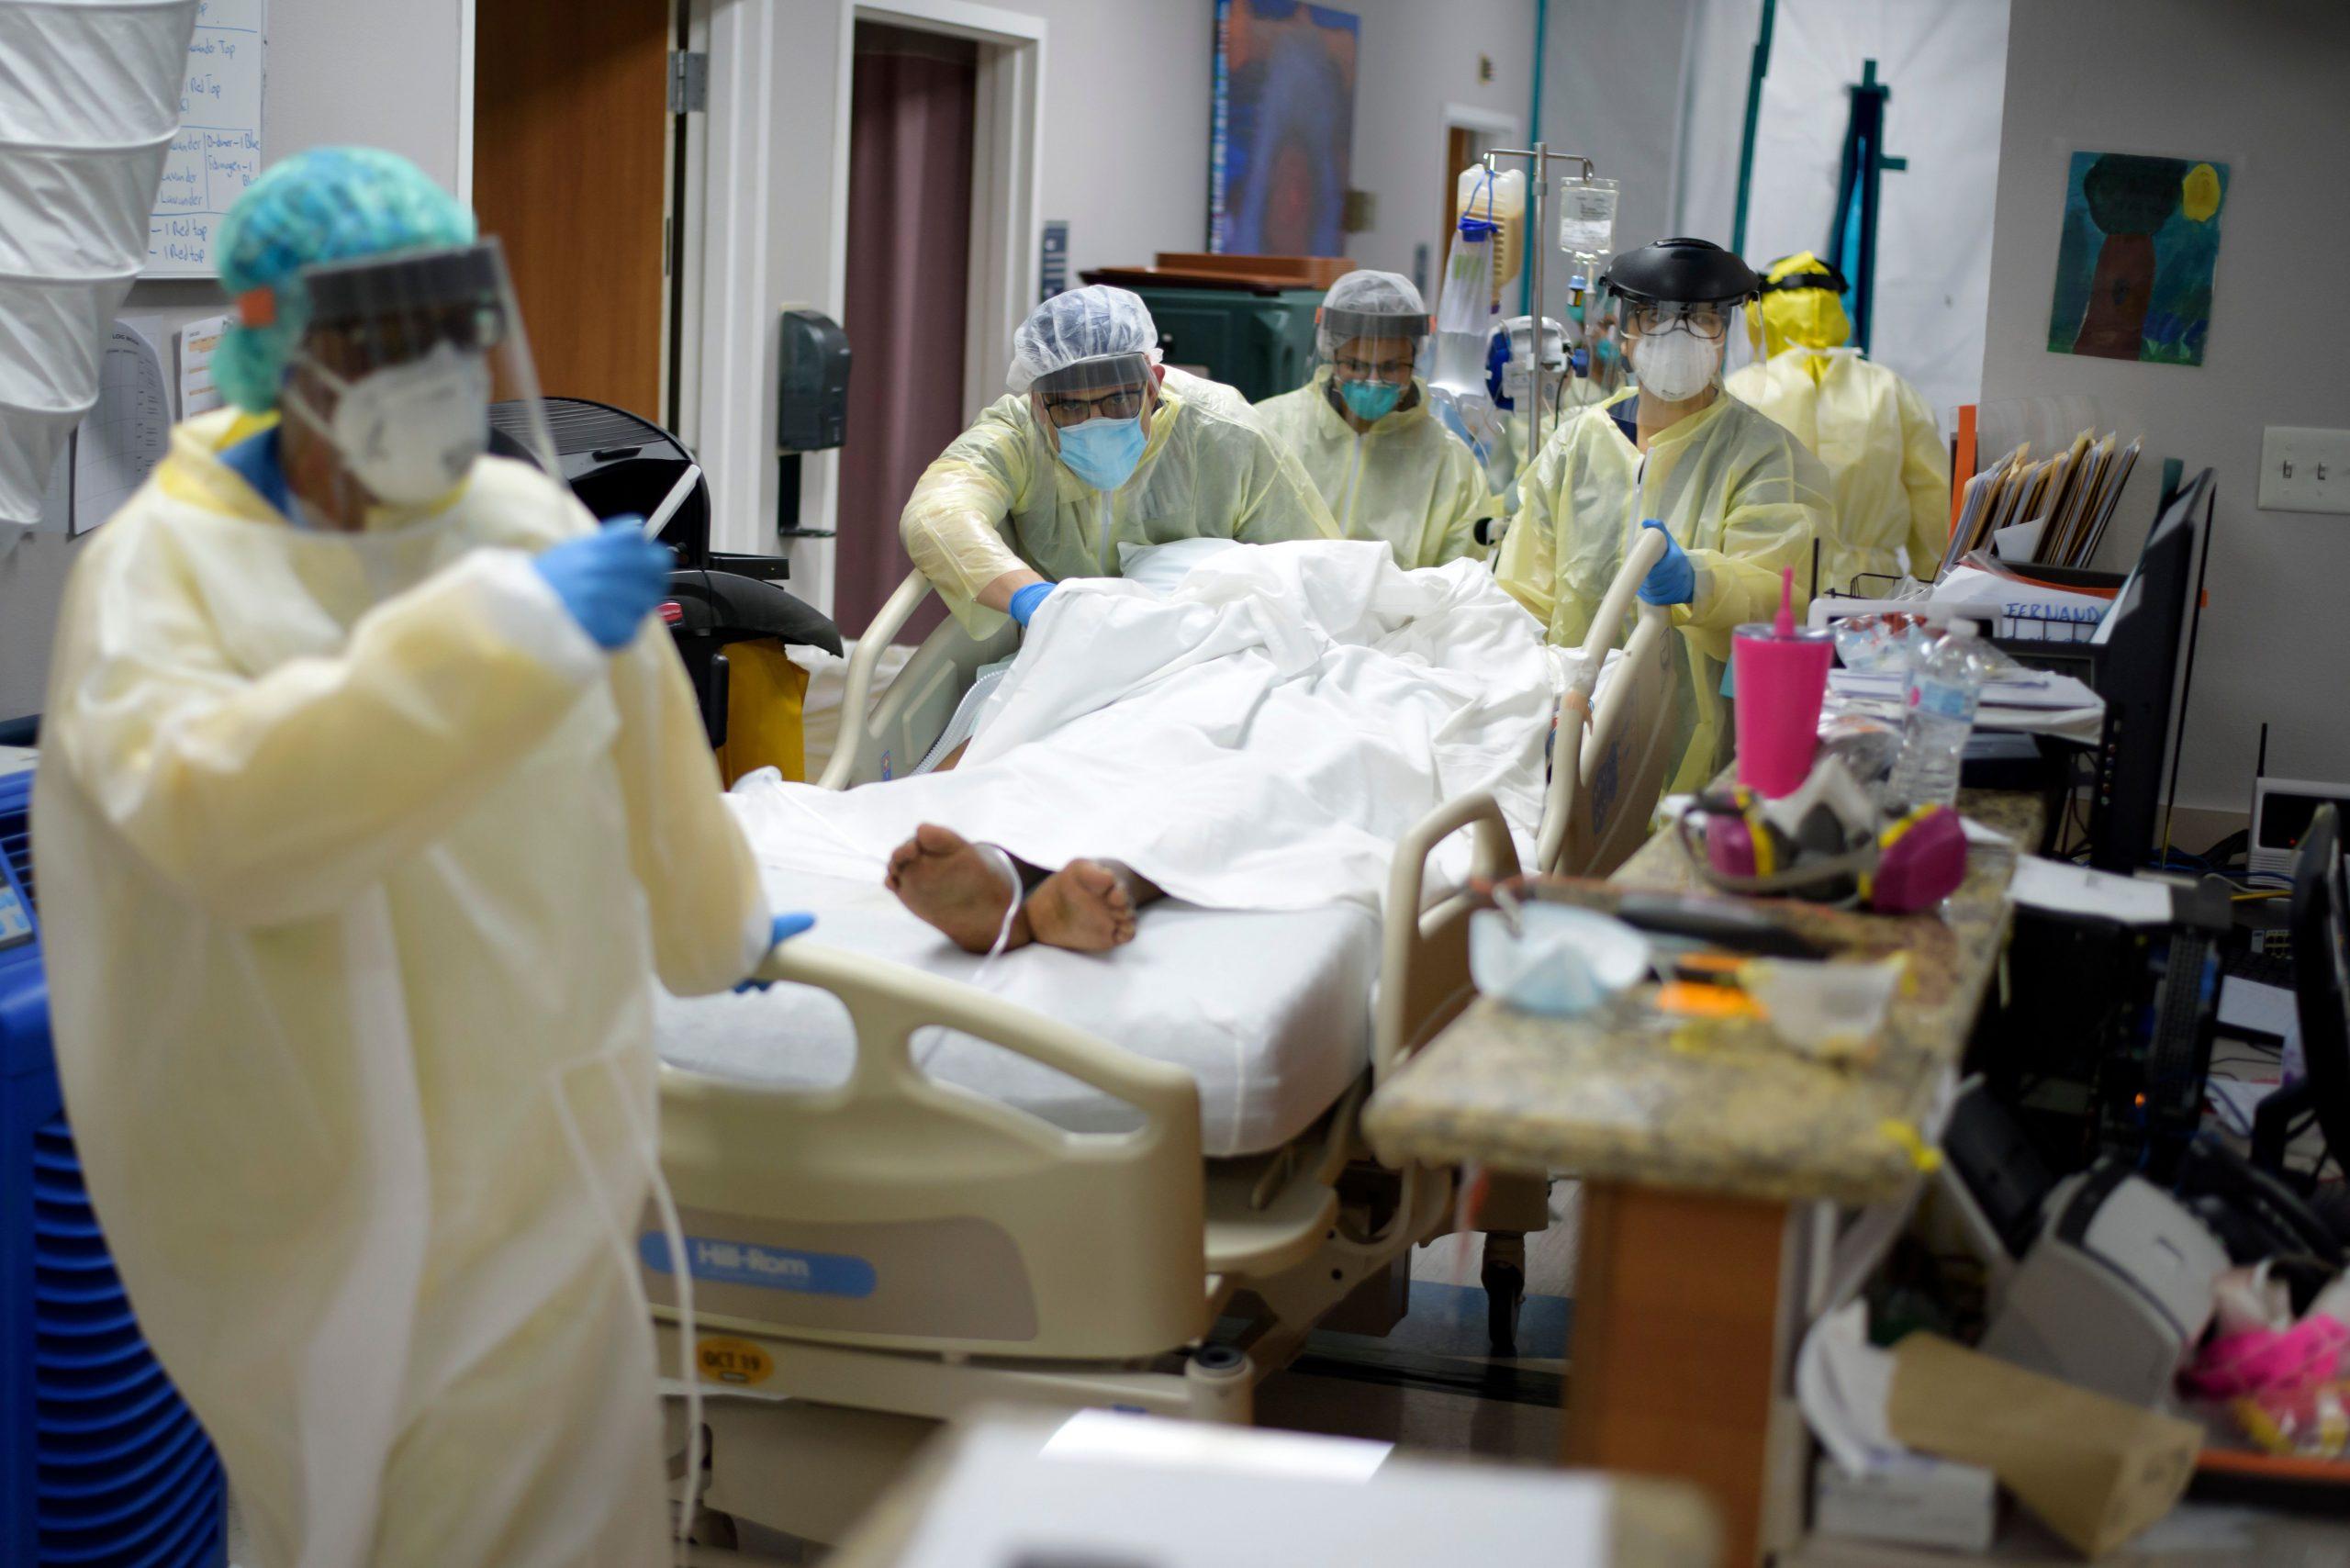 Coronavirus on track to overwhelm Houston hospitals in two weeks, mayor says